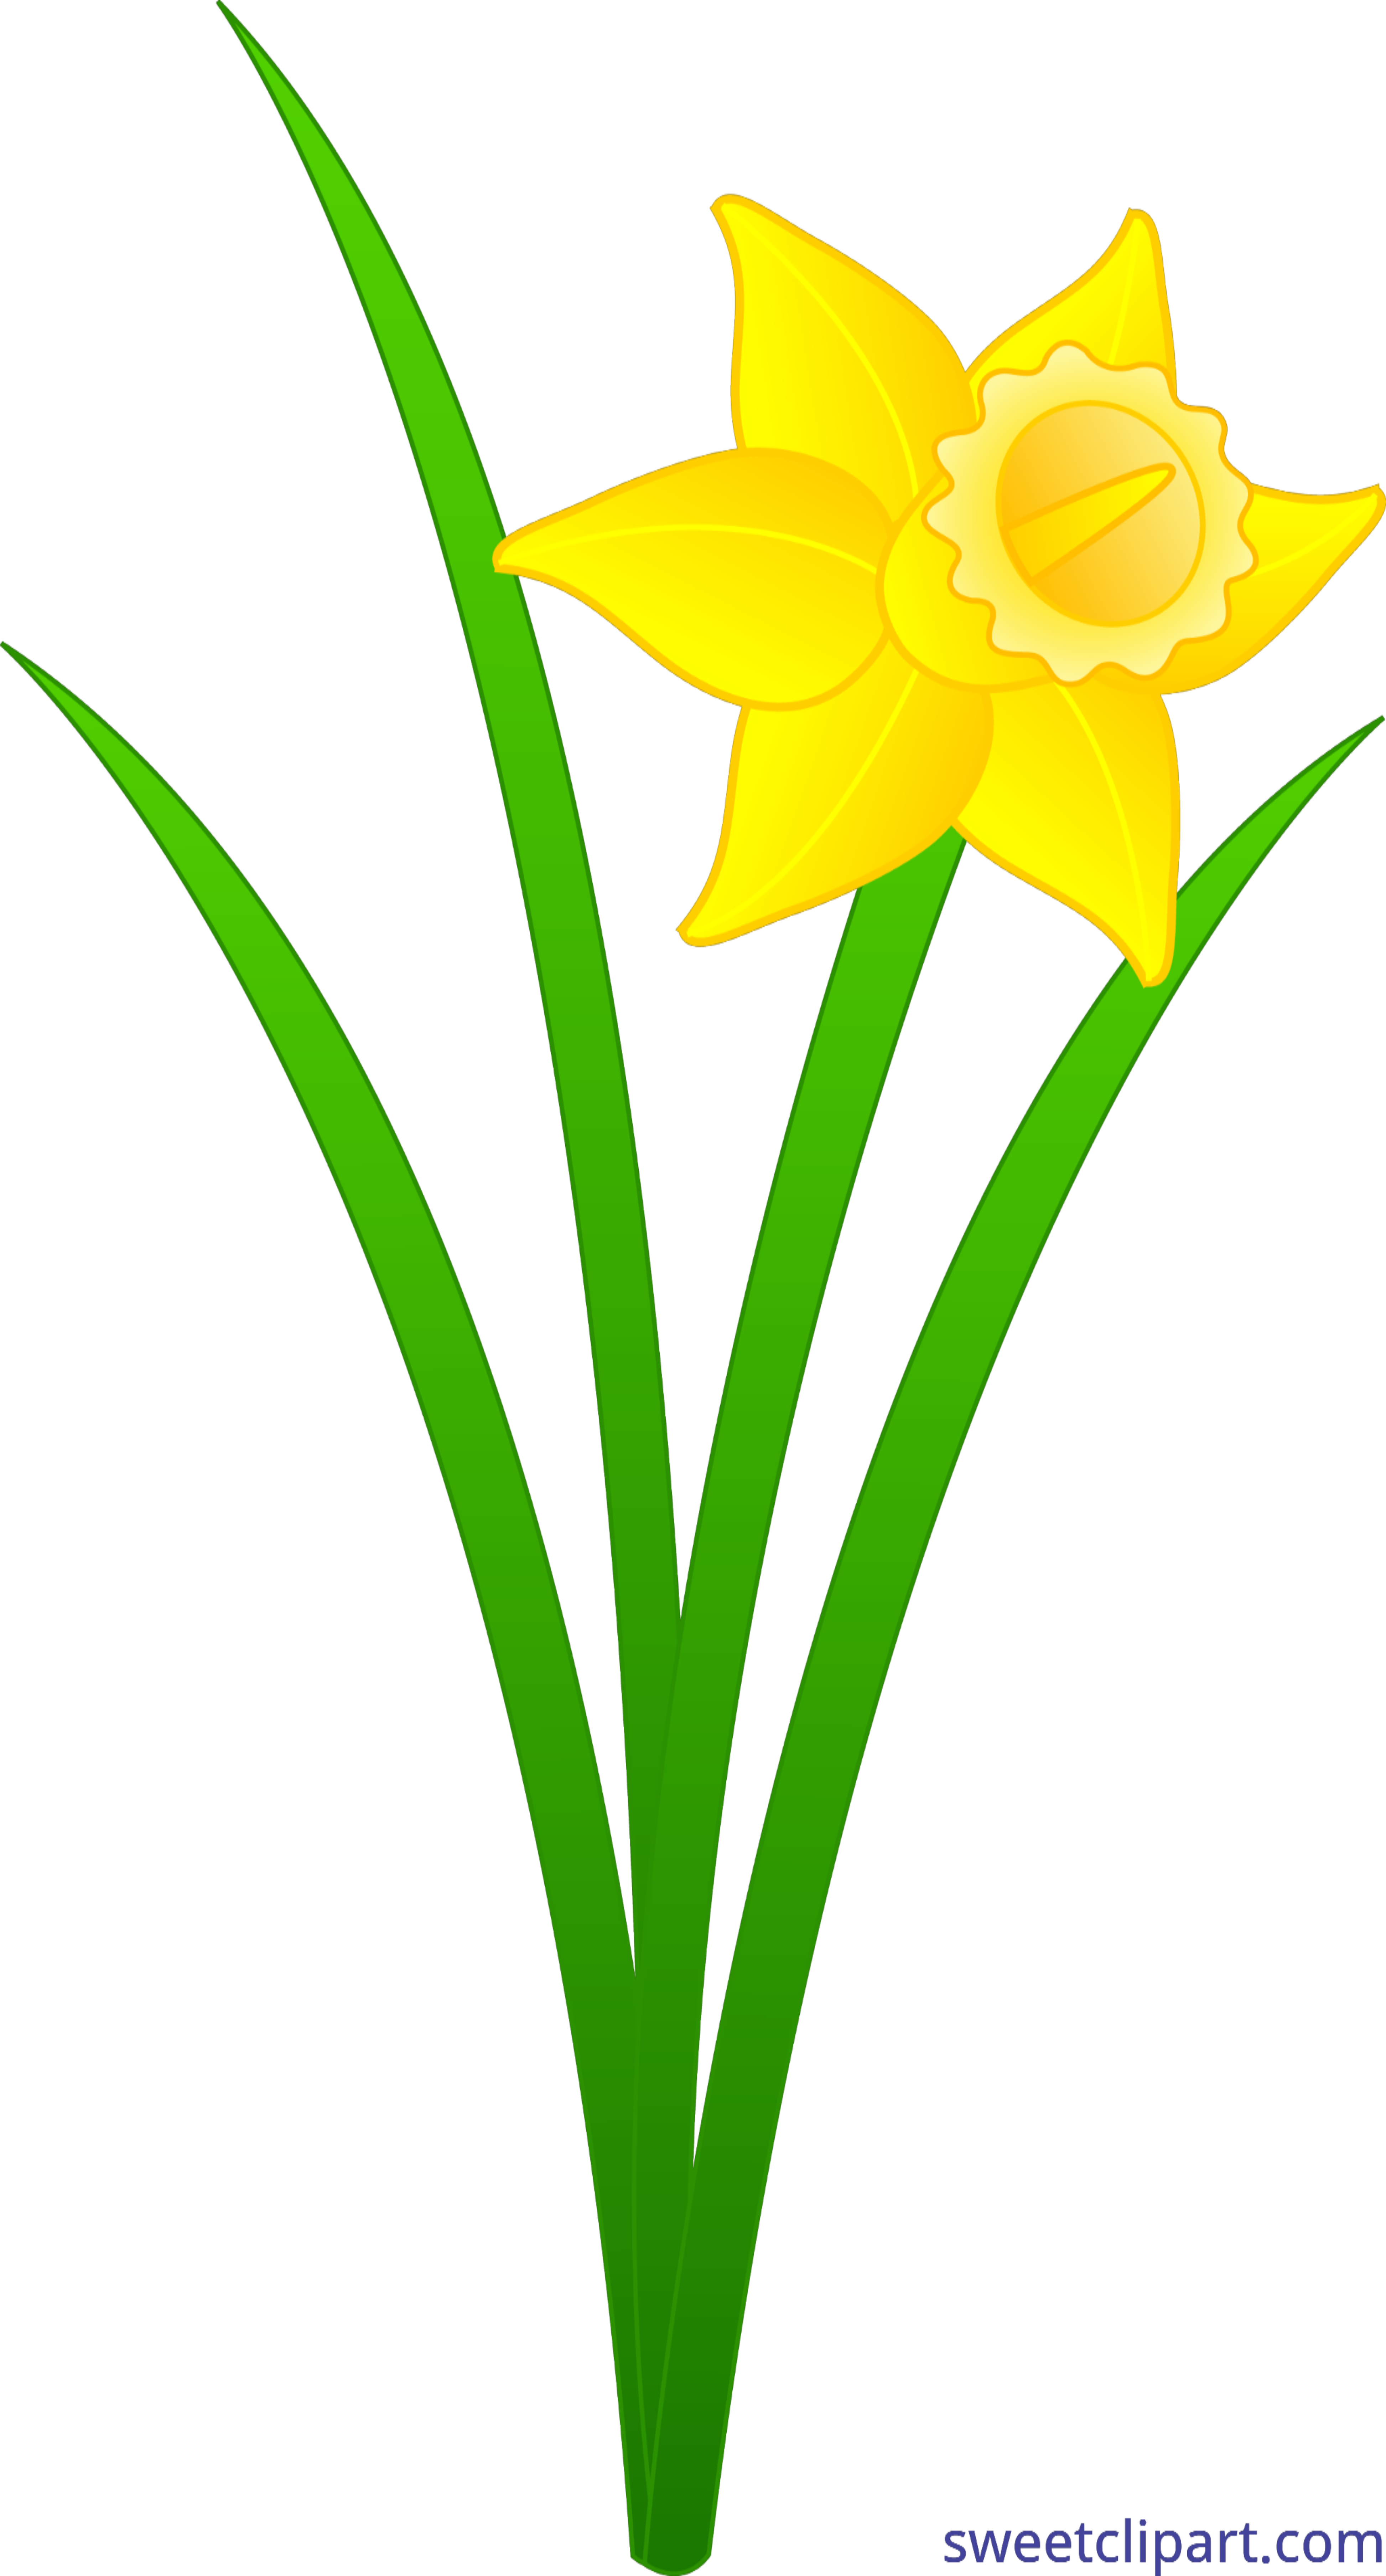 jpg transparent library Daffodil clipart. Golden clip art sweet